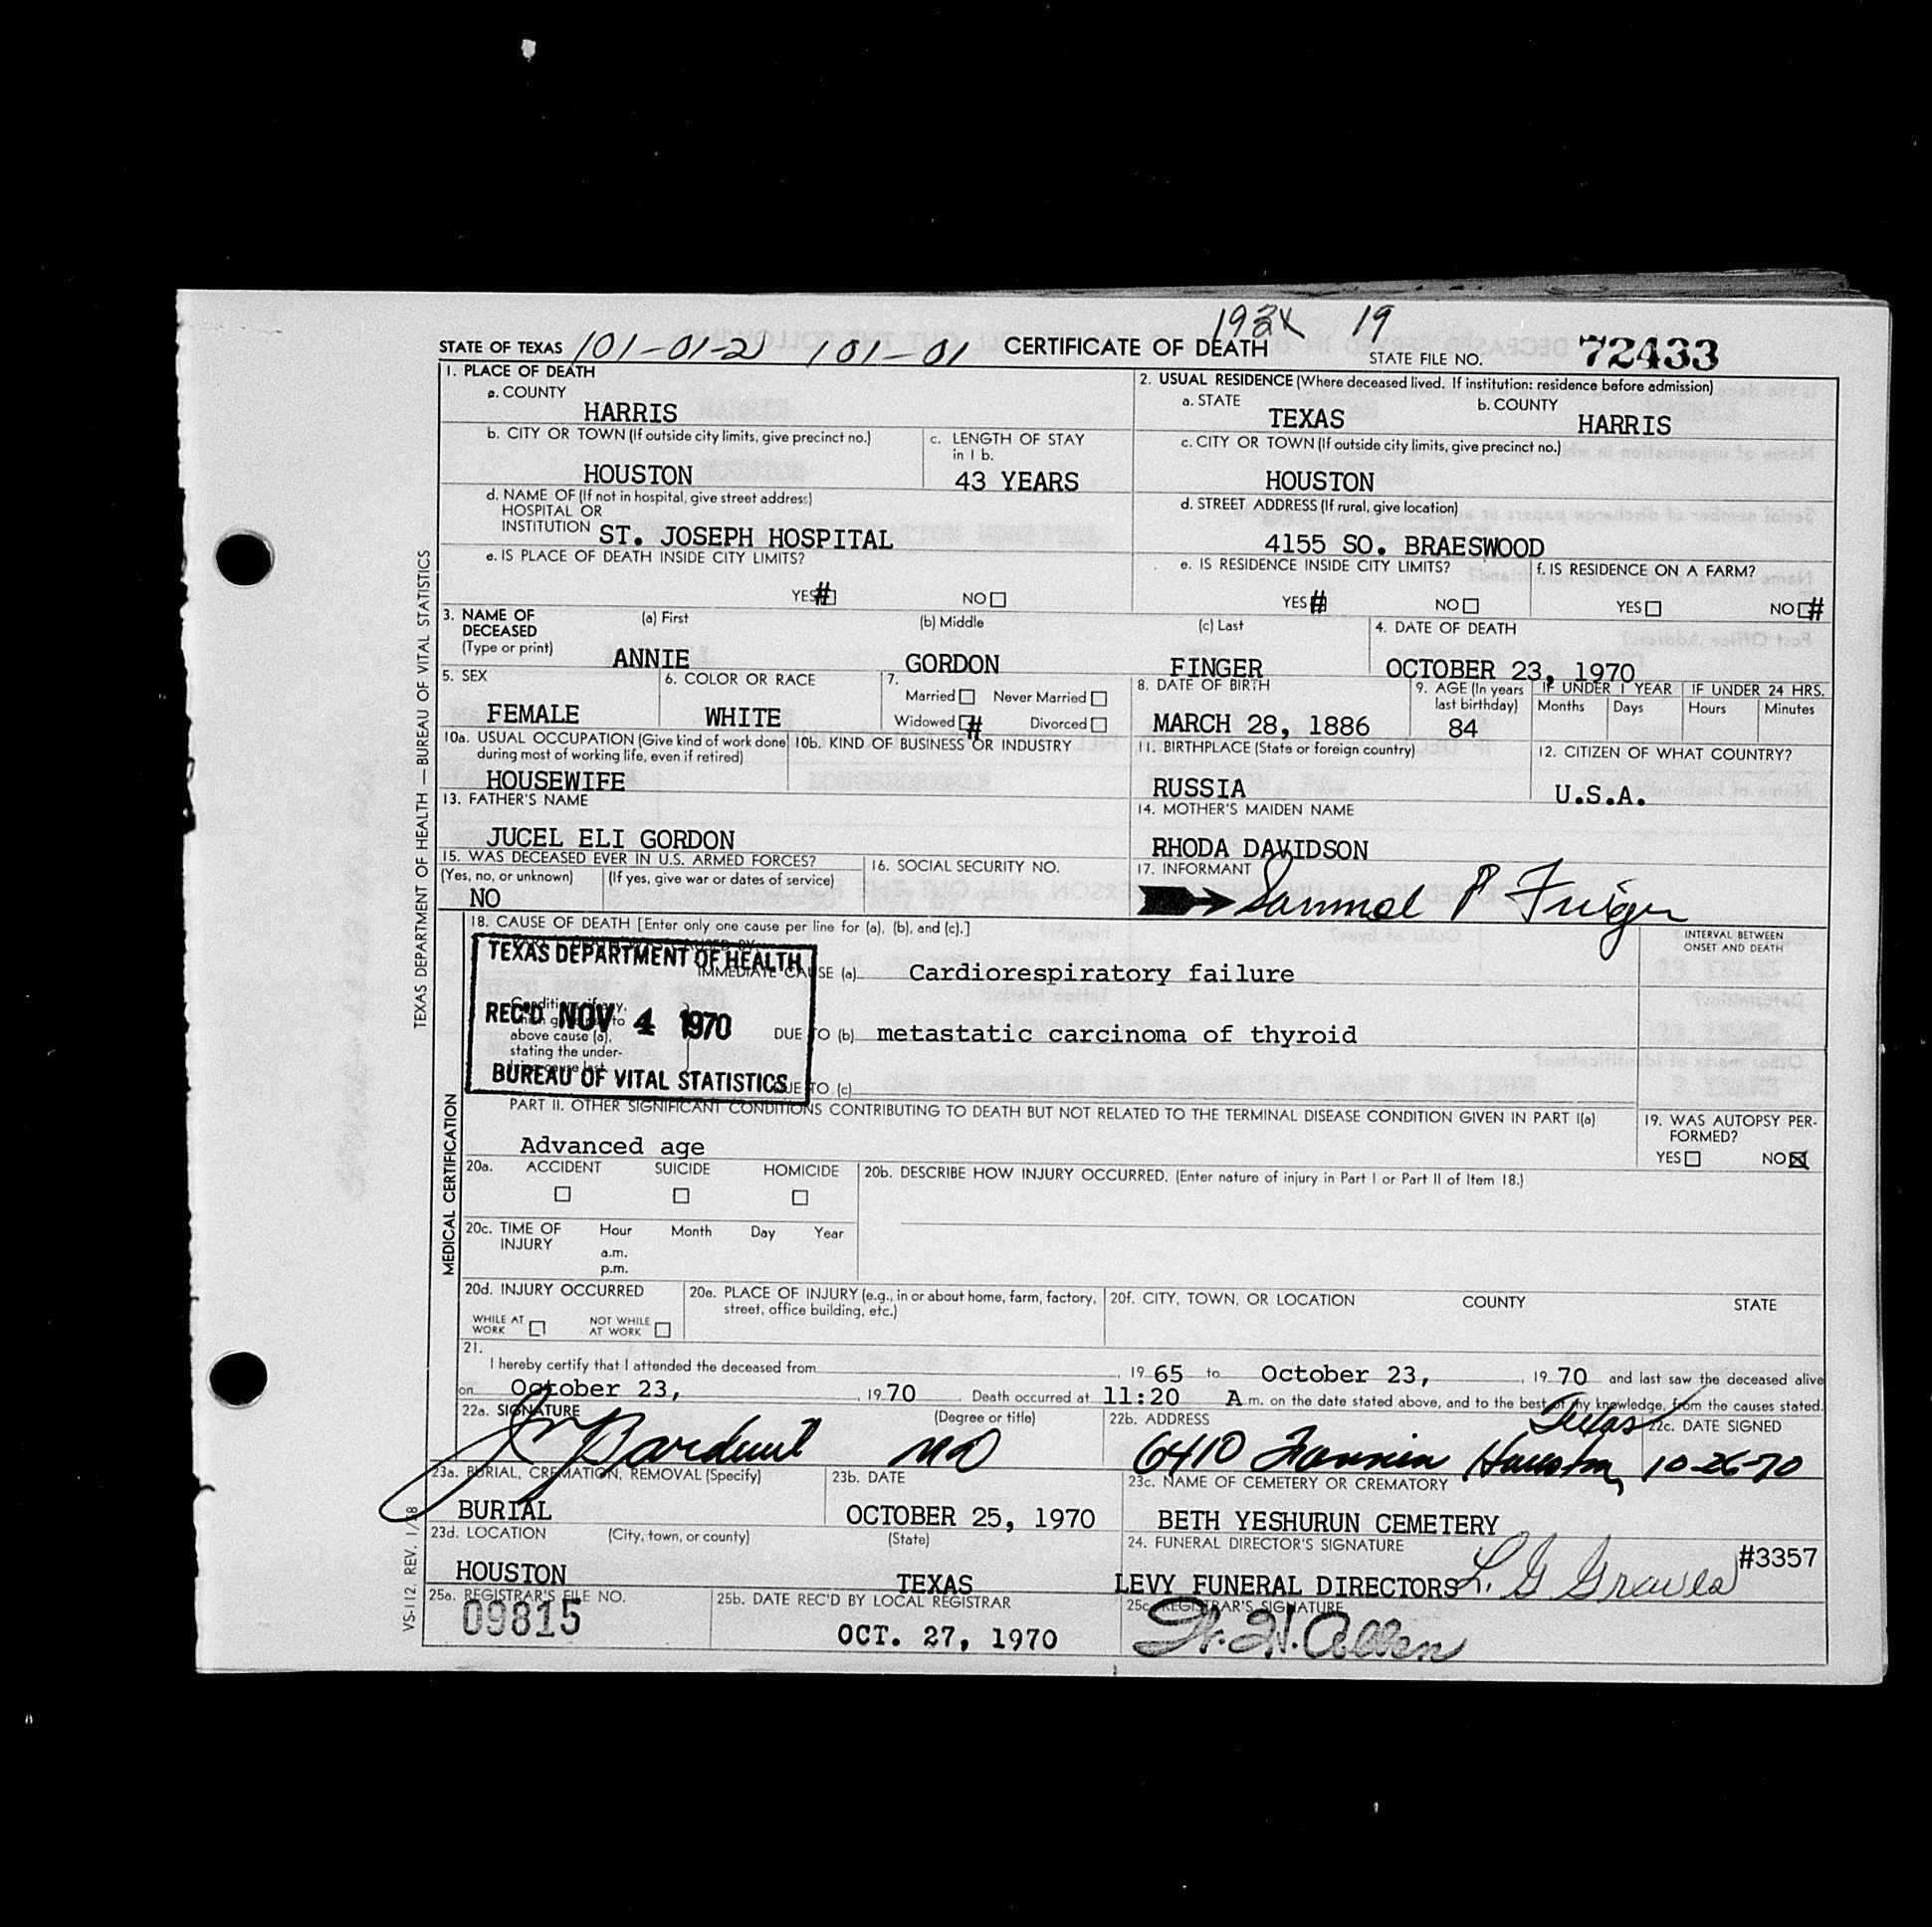 Annie Gordon Finger Death 23 Oct 1970 Place Houston Harris Tx Usa